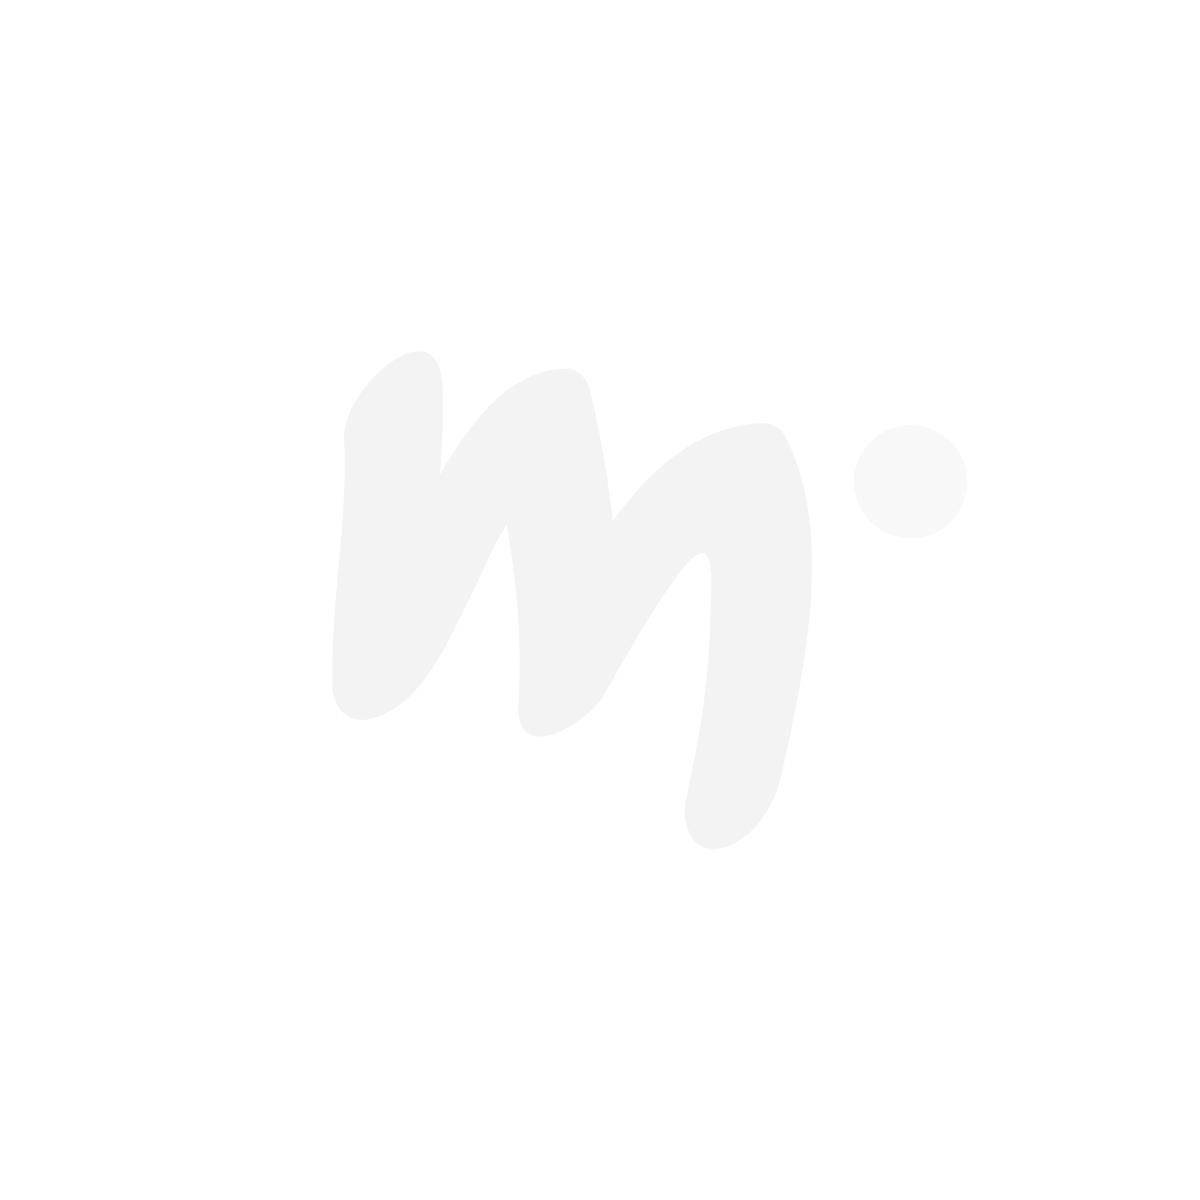 Muumi Syyshetki-pipo harmaa